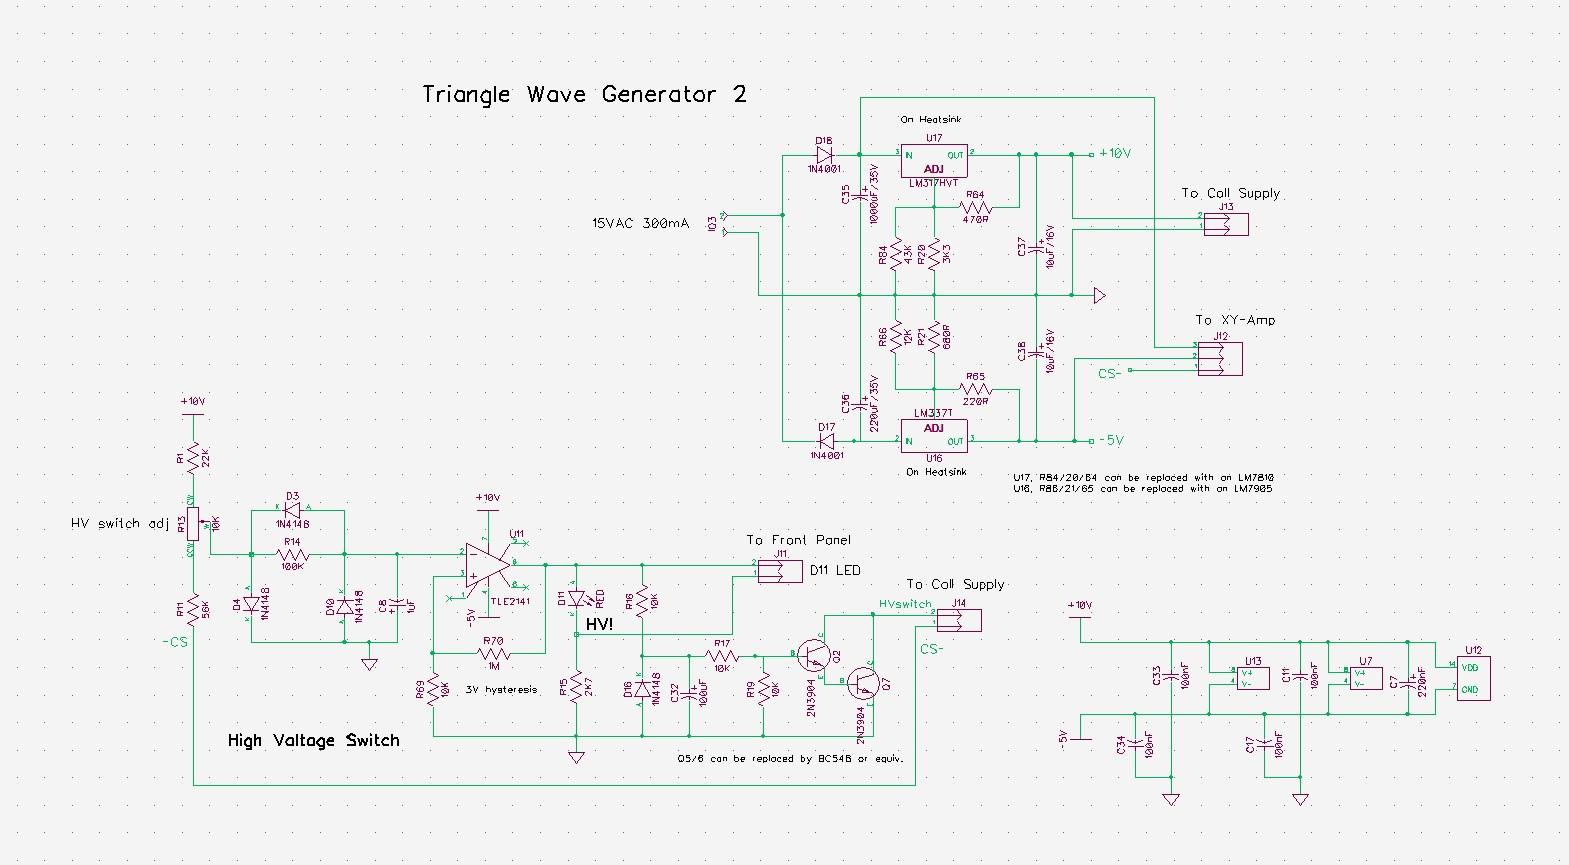 murray lp012df panel board 125a amp 240v ac circuit breaker b32199730m jfet source follower circuit diagram tradeoficcom automotivesweep for curve tracer circuit diagram tradeoficcom index listingrs232